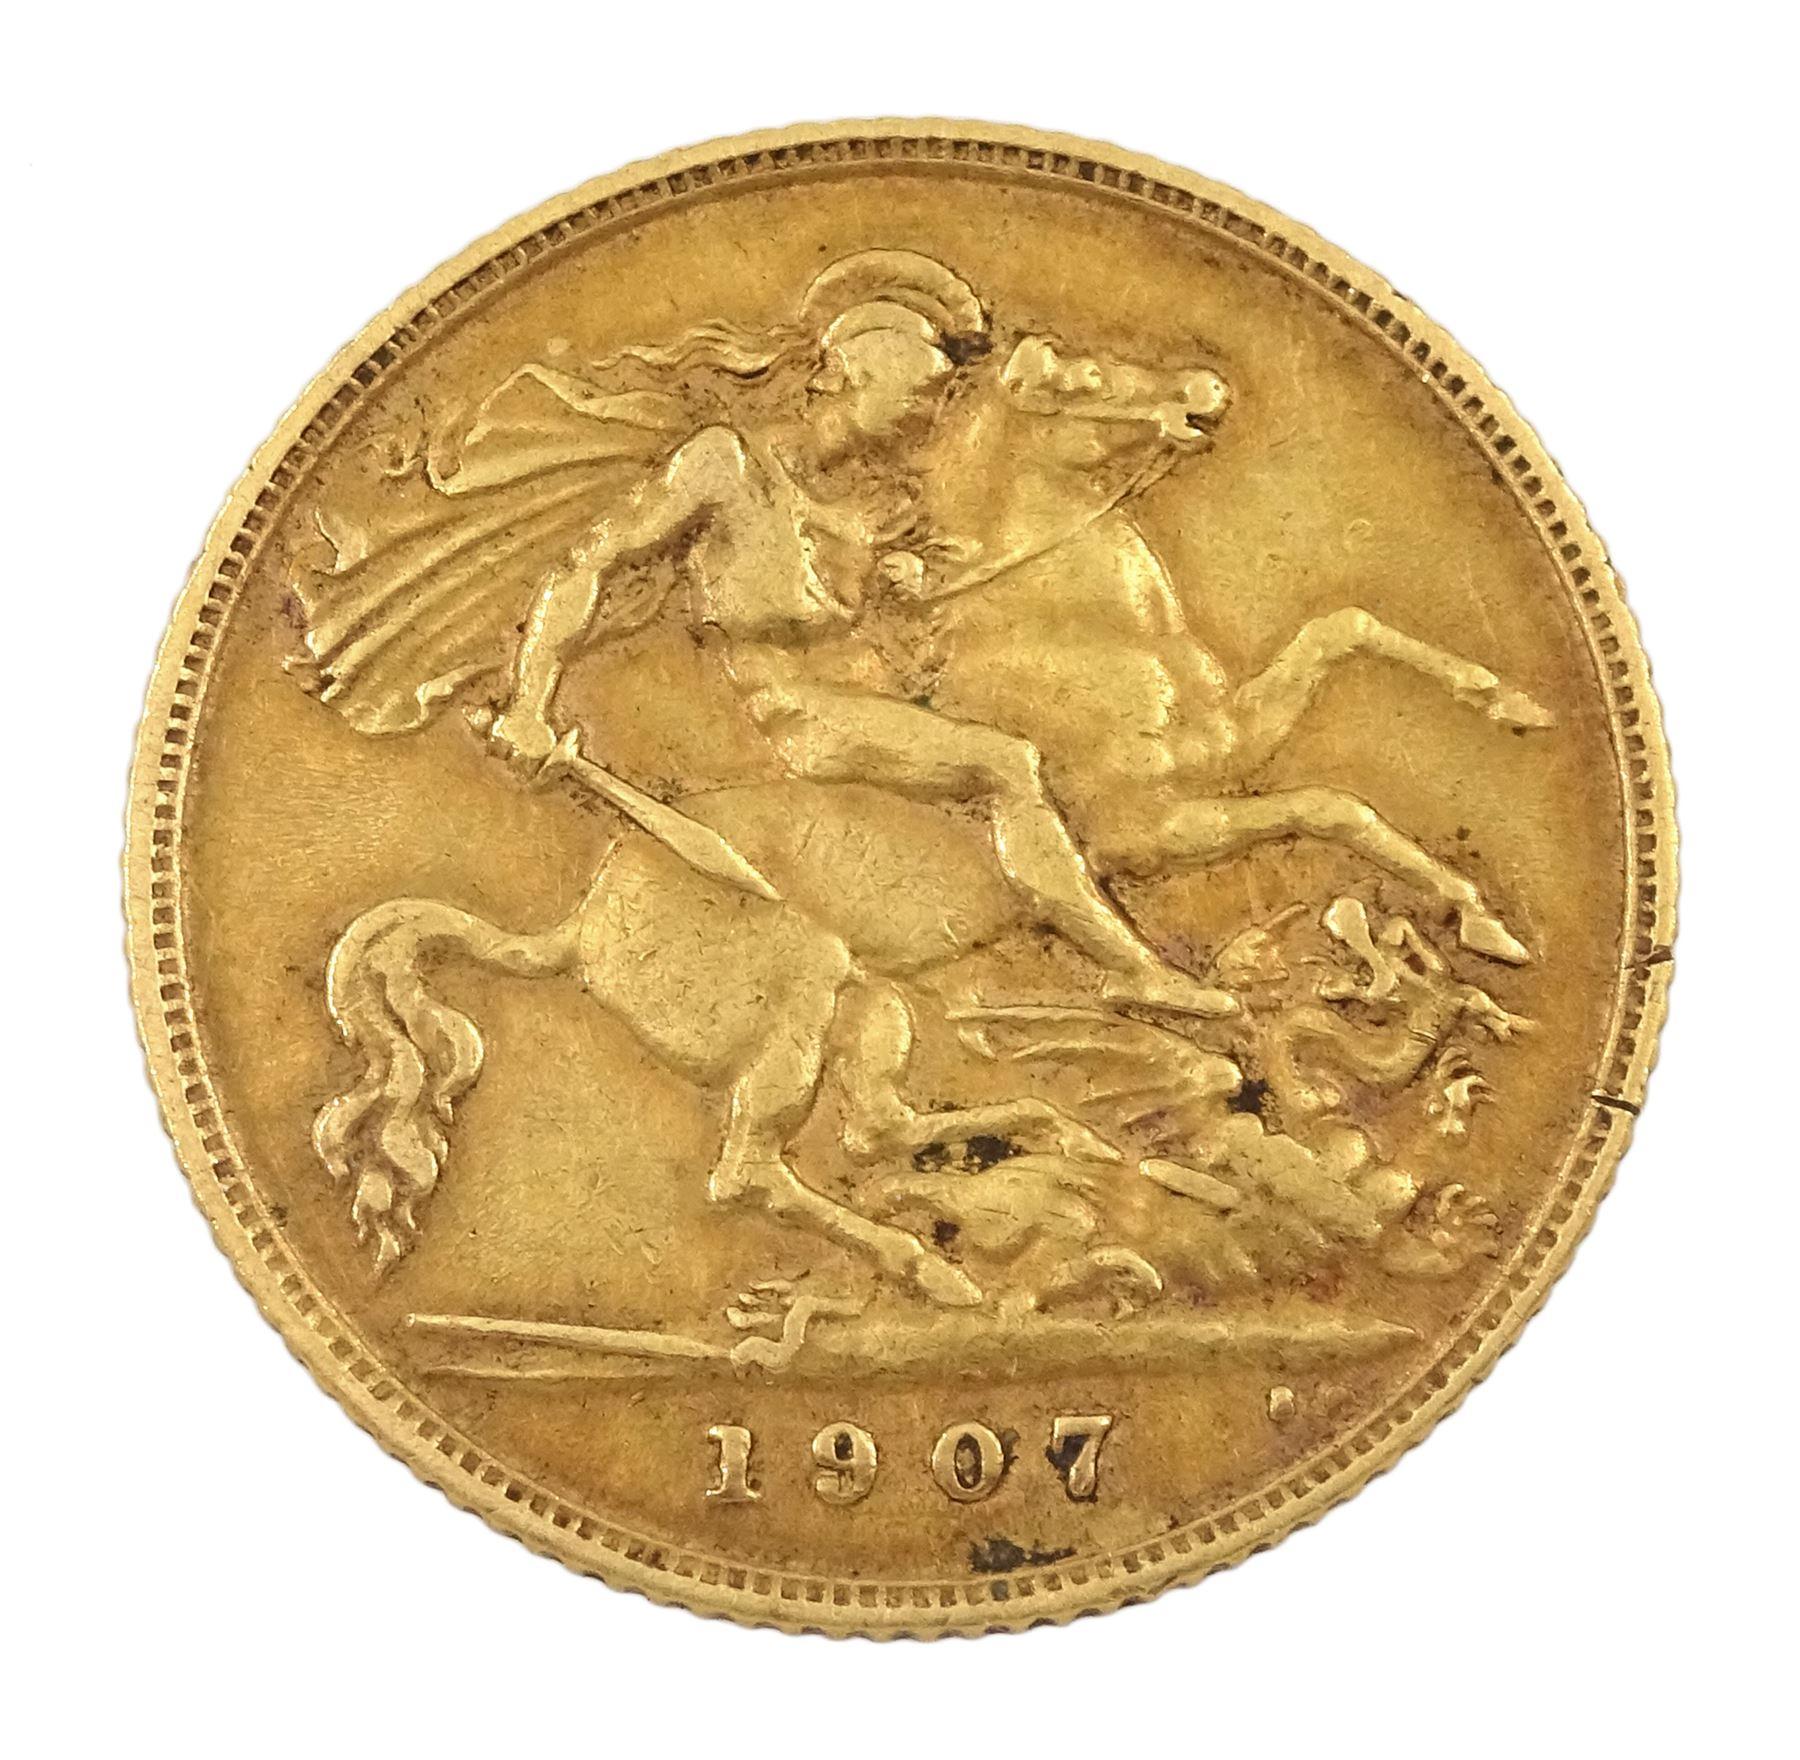 King Edward VII 1907 gold half sovereign coin - Image 2 of 2